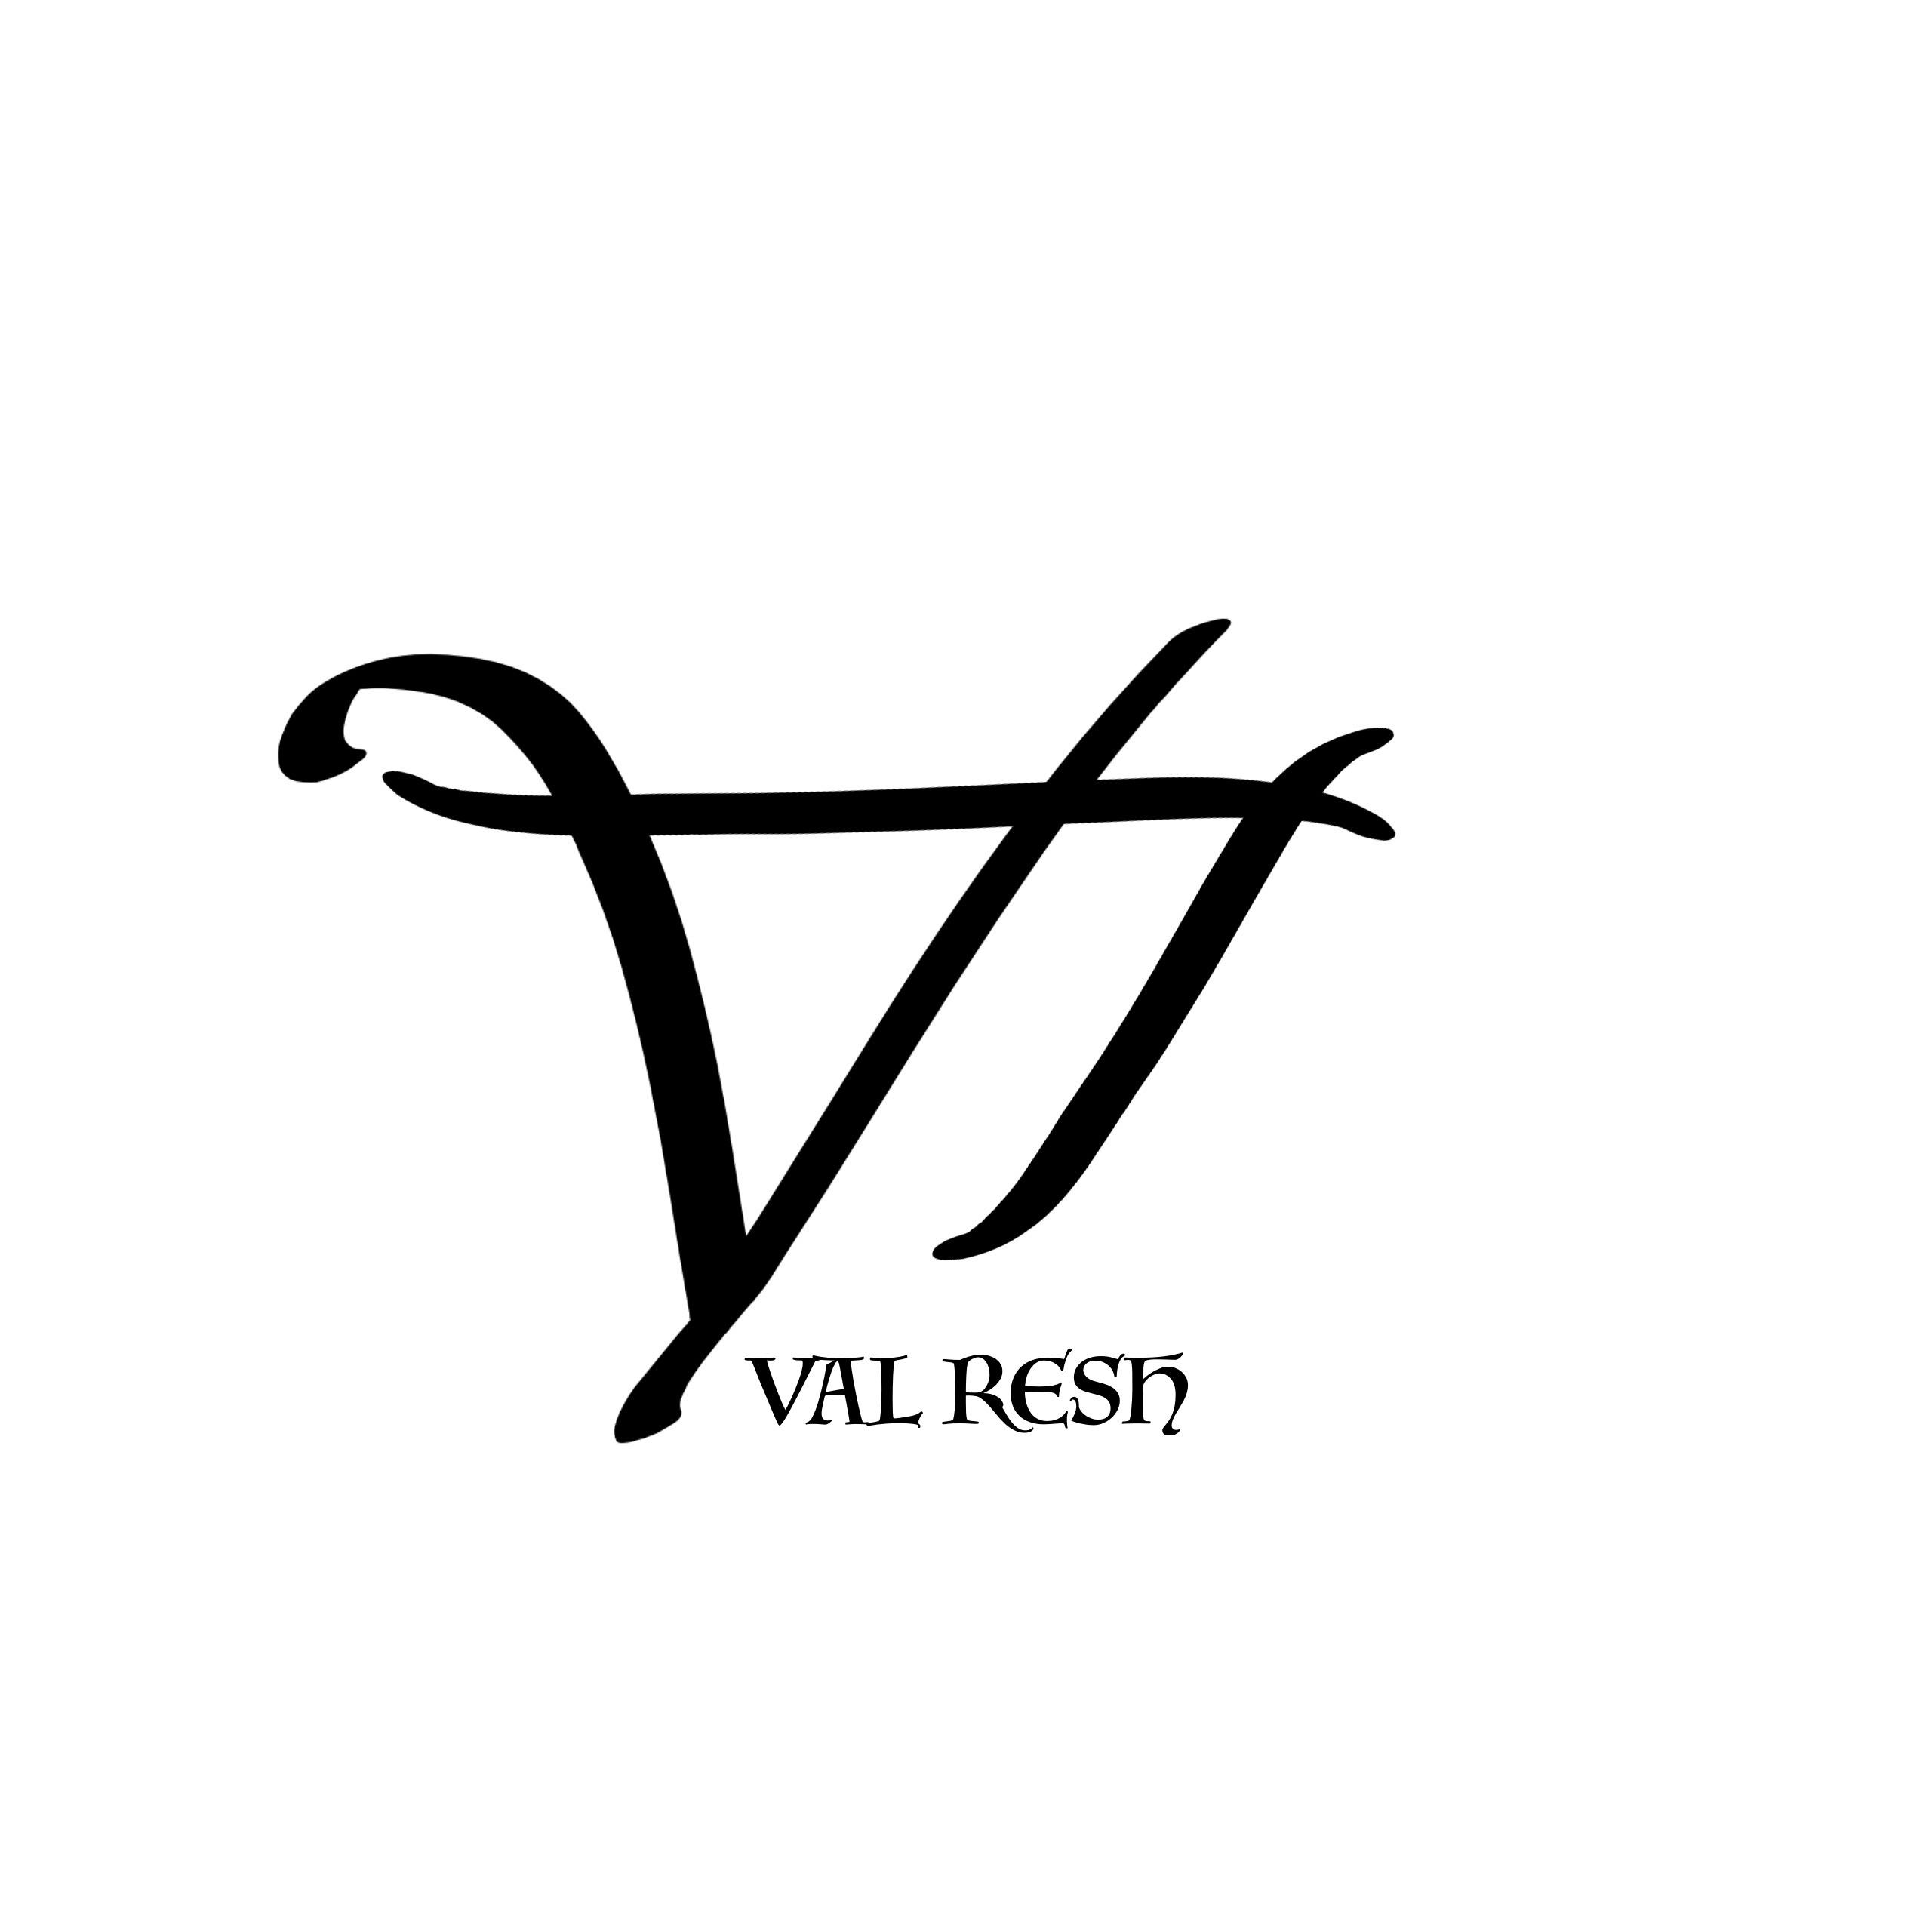 Val Resh